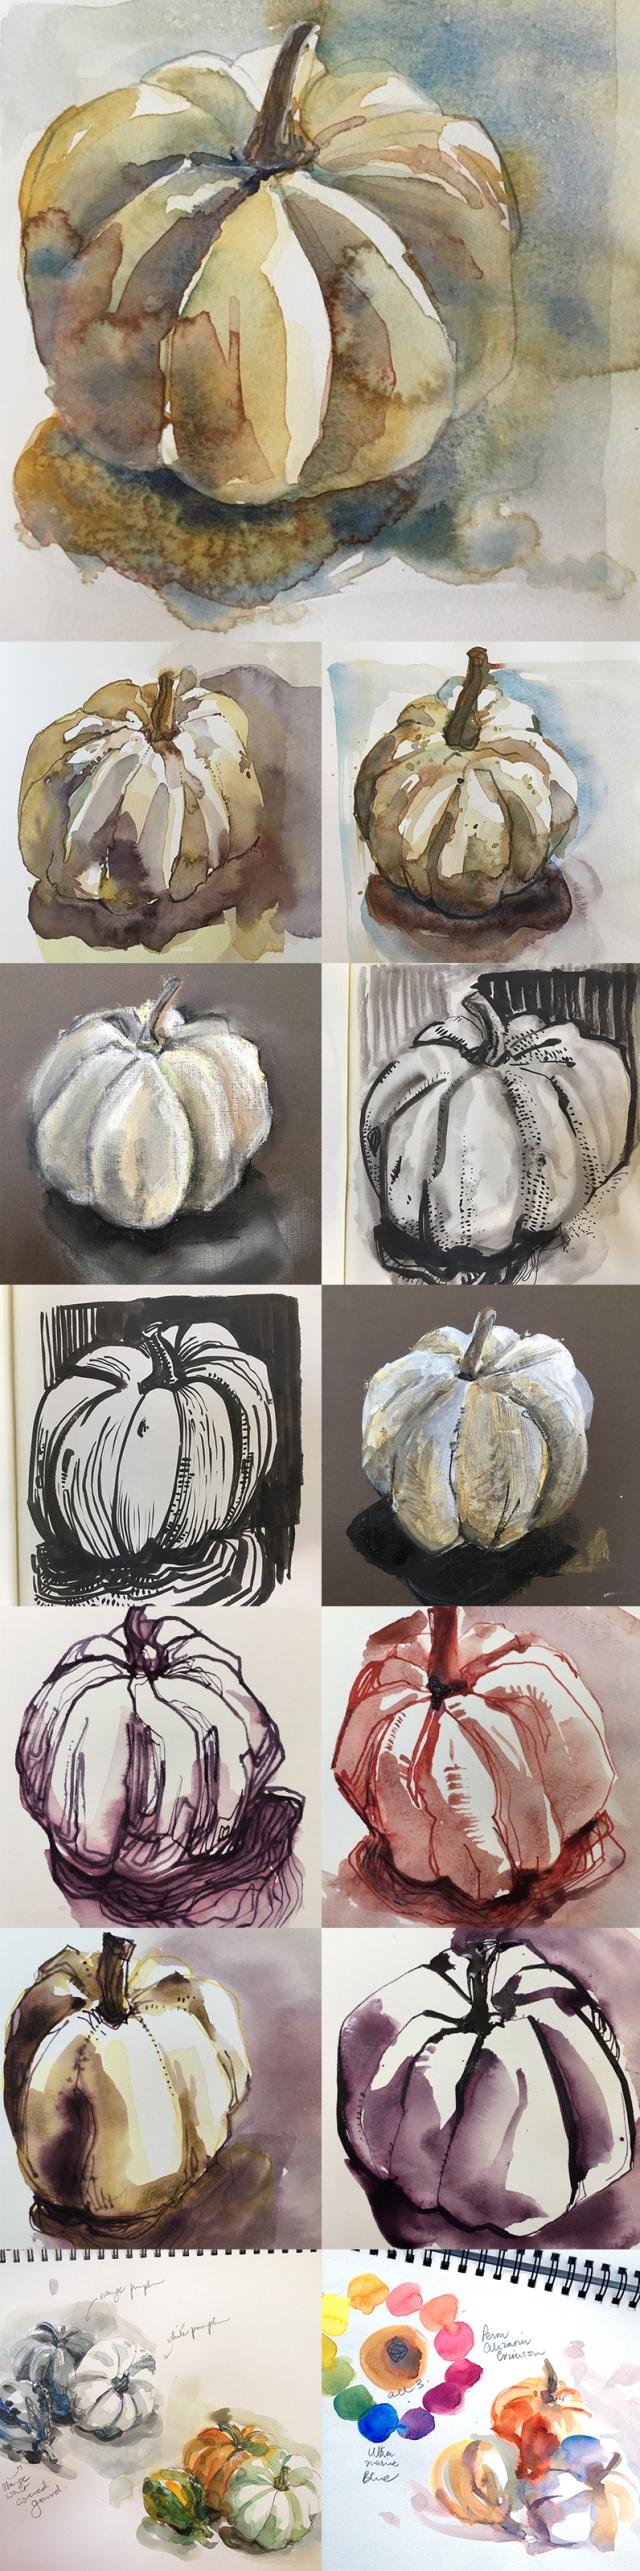 many_pumpkins